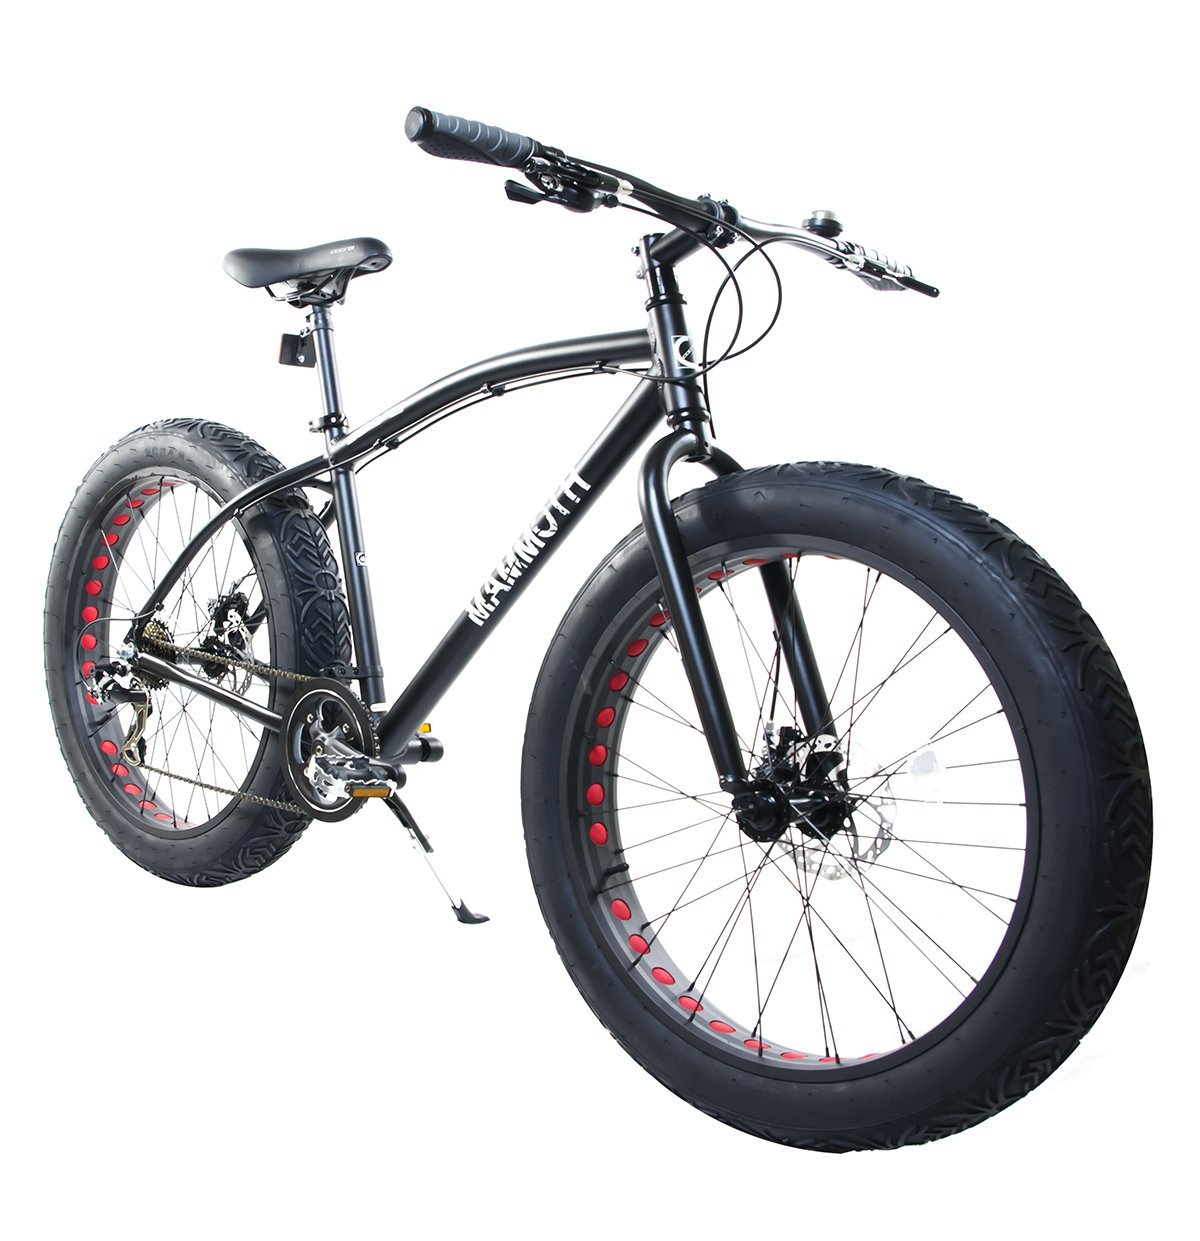 Alton mammoth fat tire bike